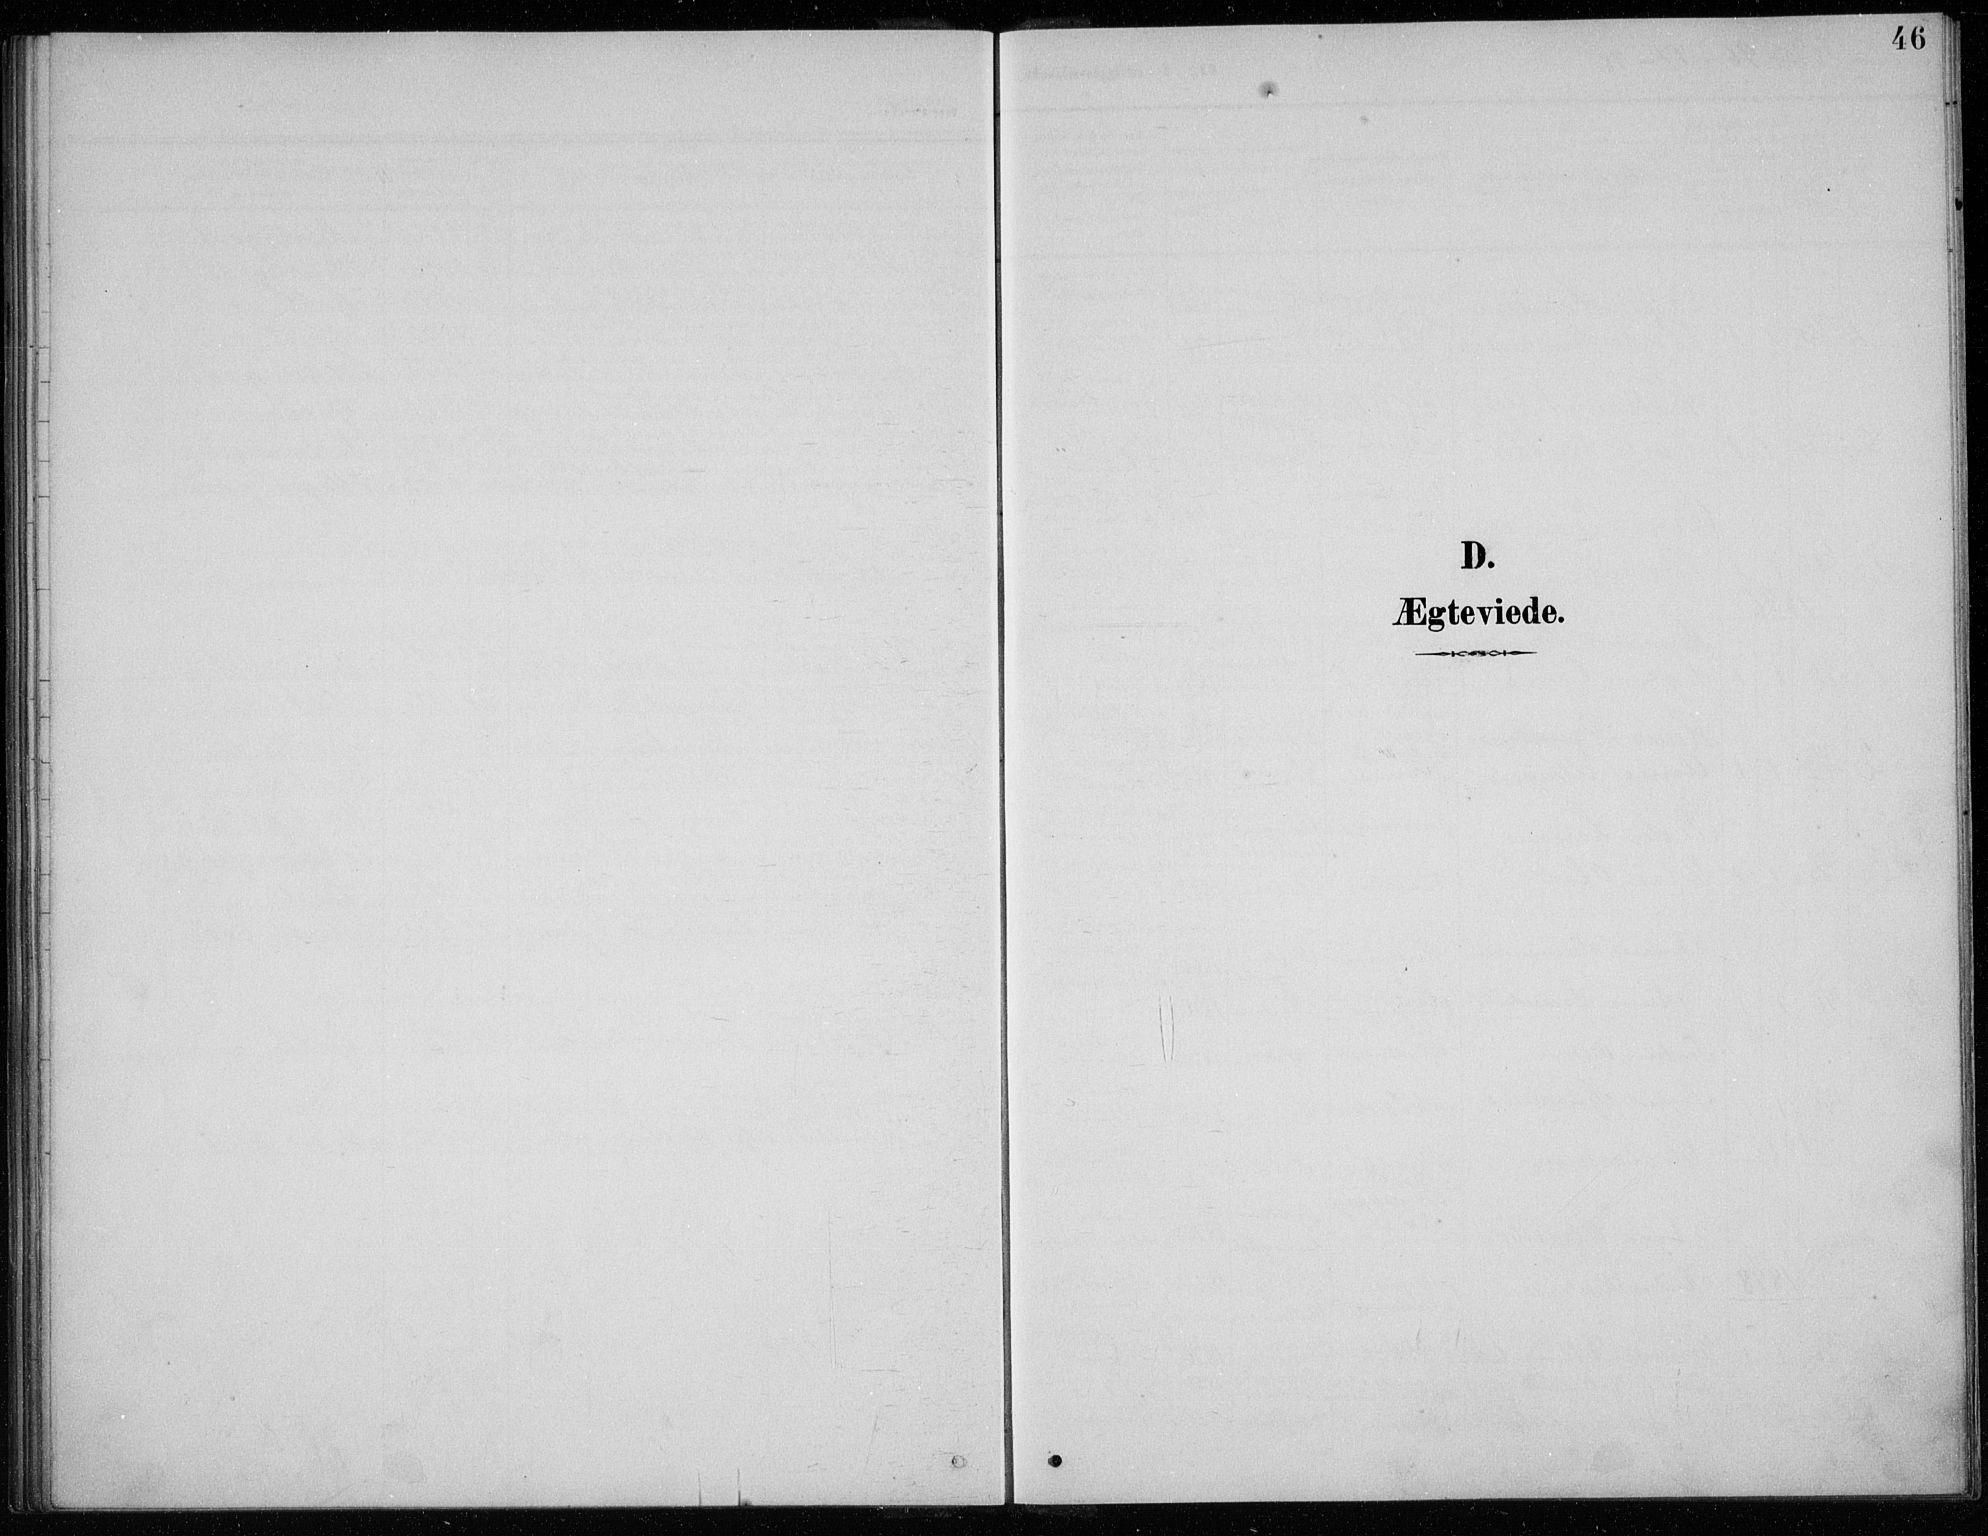 SAB, Balestrand sokneprestembete, H/Hab/Habc/L0003: Klokkerbok nr. C 3, 1895-1927, s. 46